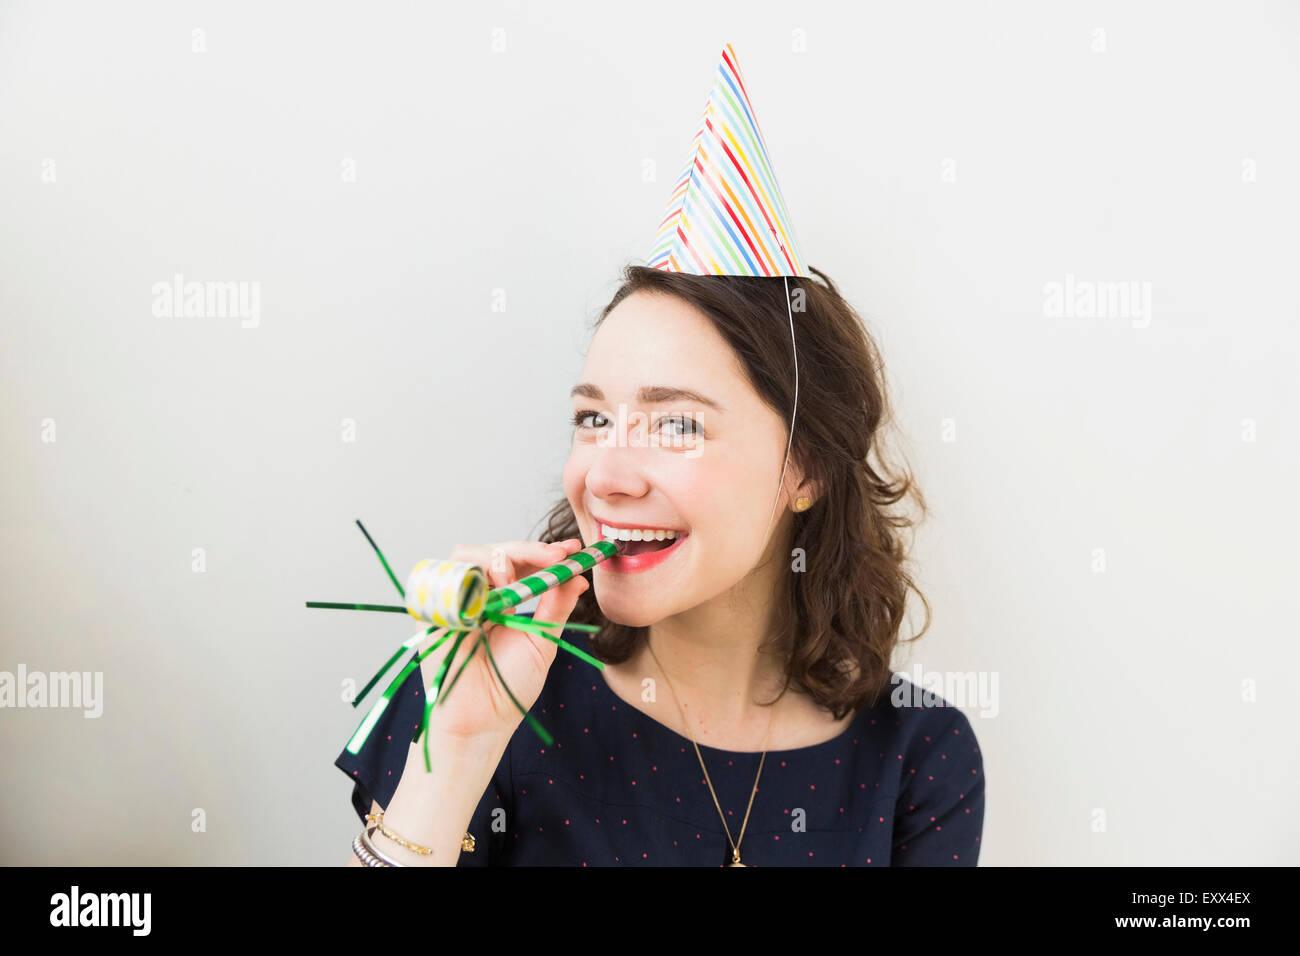 Lächelnde junge Frau mit Partei Horn Gebläse Stockbild